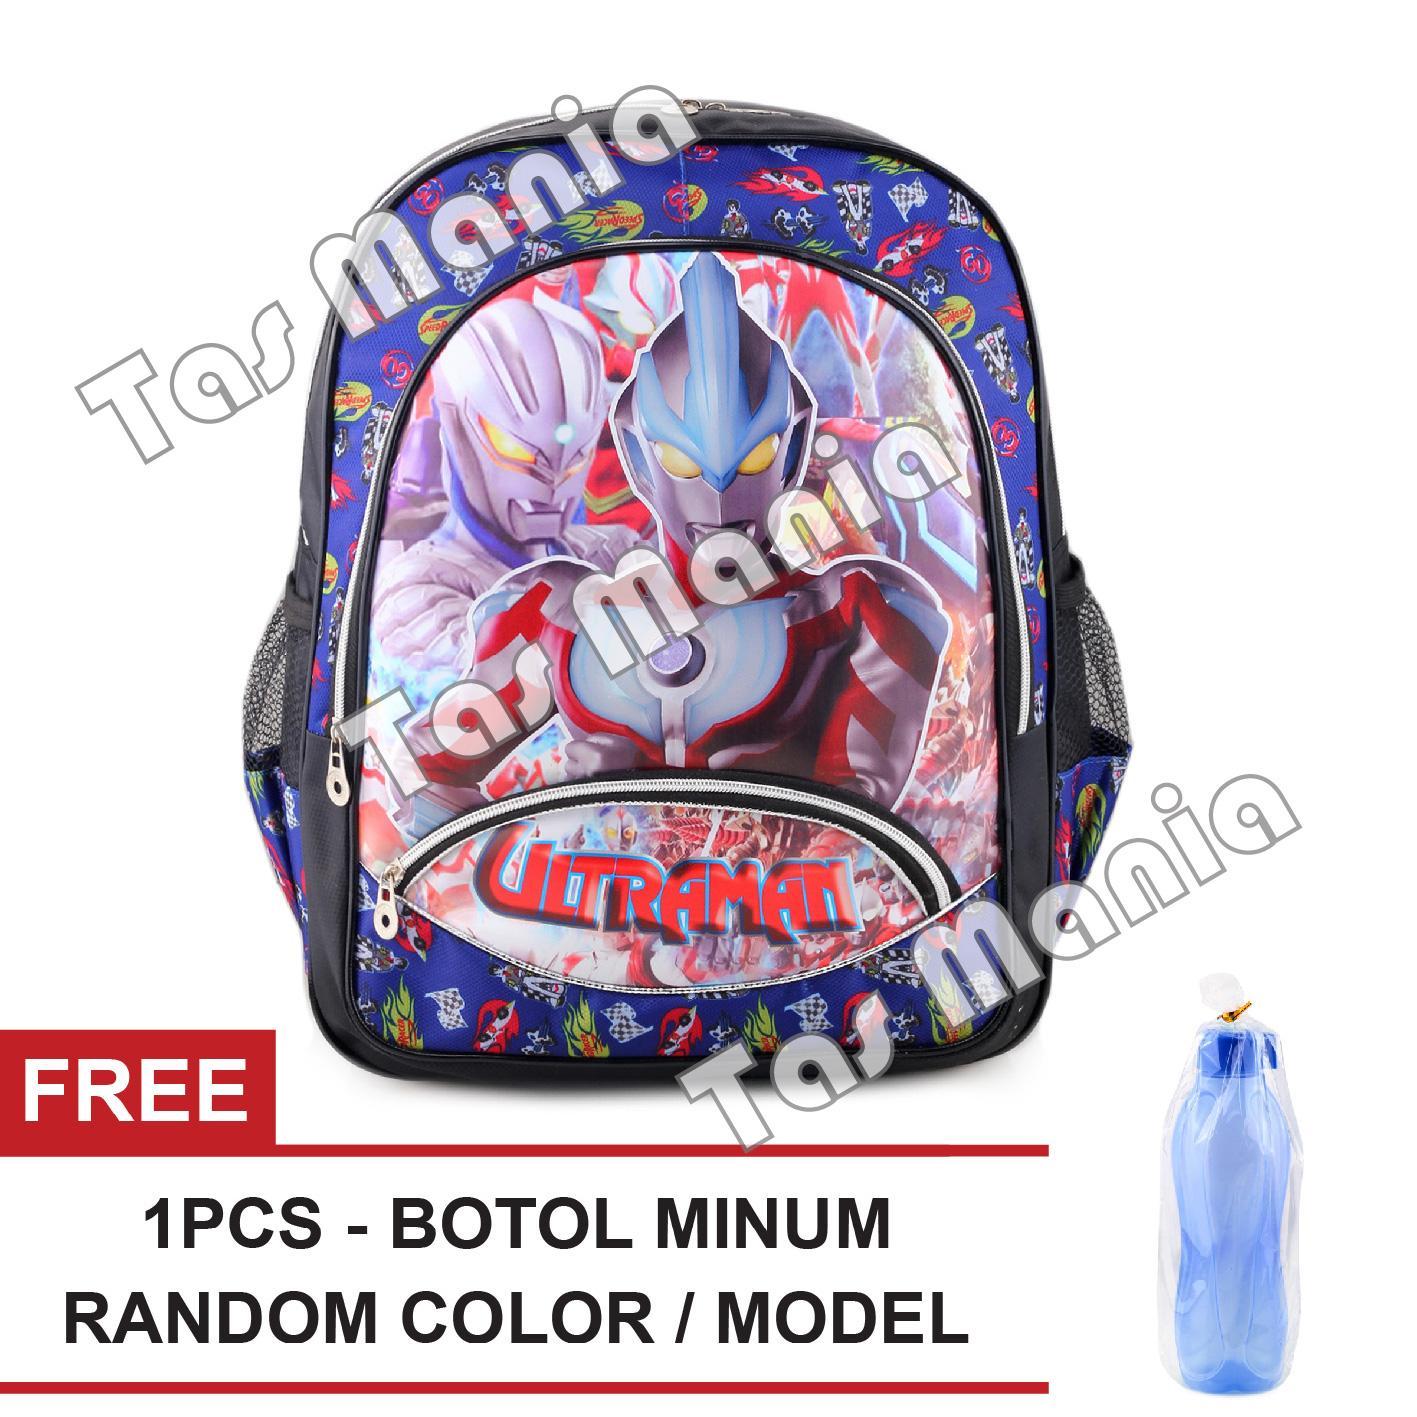 Tas Ransel Anak - Ultramen - Cosmic Rays - School Bag Tas Sekolah Anak - BLUE + FREE Botol Minum  Random Color / Model Tas Anak Tas Sekolah Tas Anak Karakter